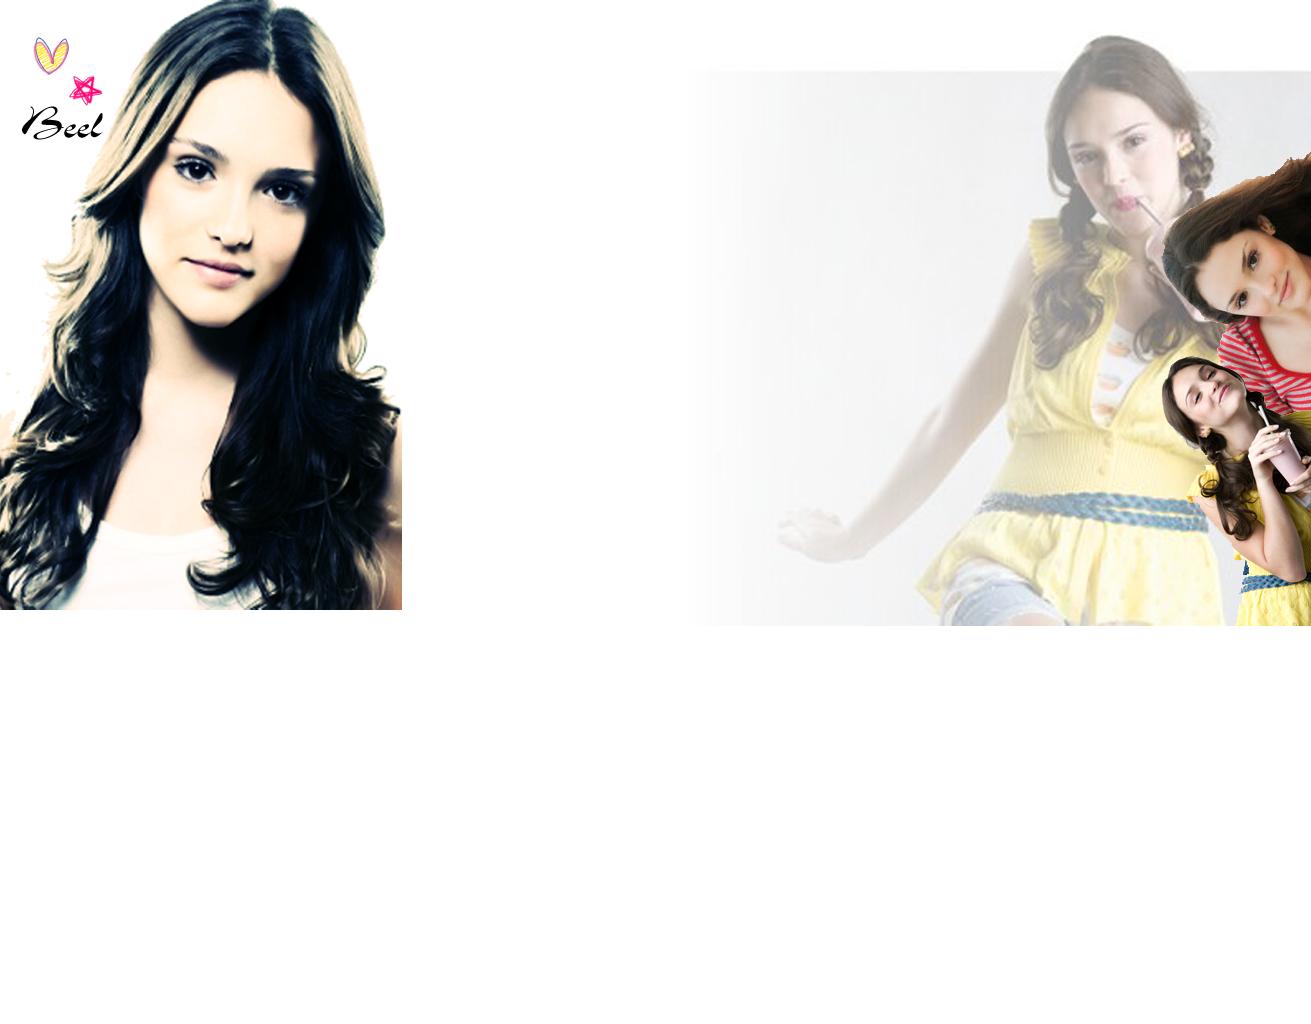 http://3.bp.blogspot.com/_Ap11XjWMo38/S6uOYczcGqI/AAAAAAAAACw/PVvi4Aepo7I/s1600/Fundo+de+Belle.jpg